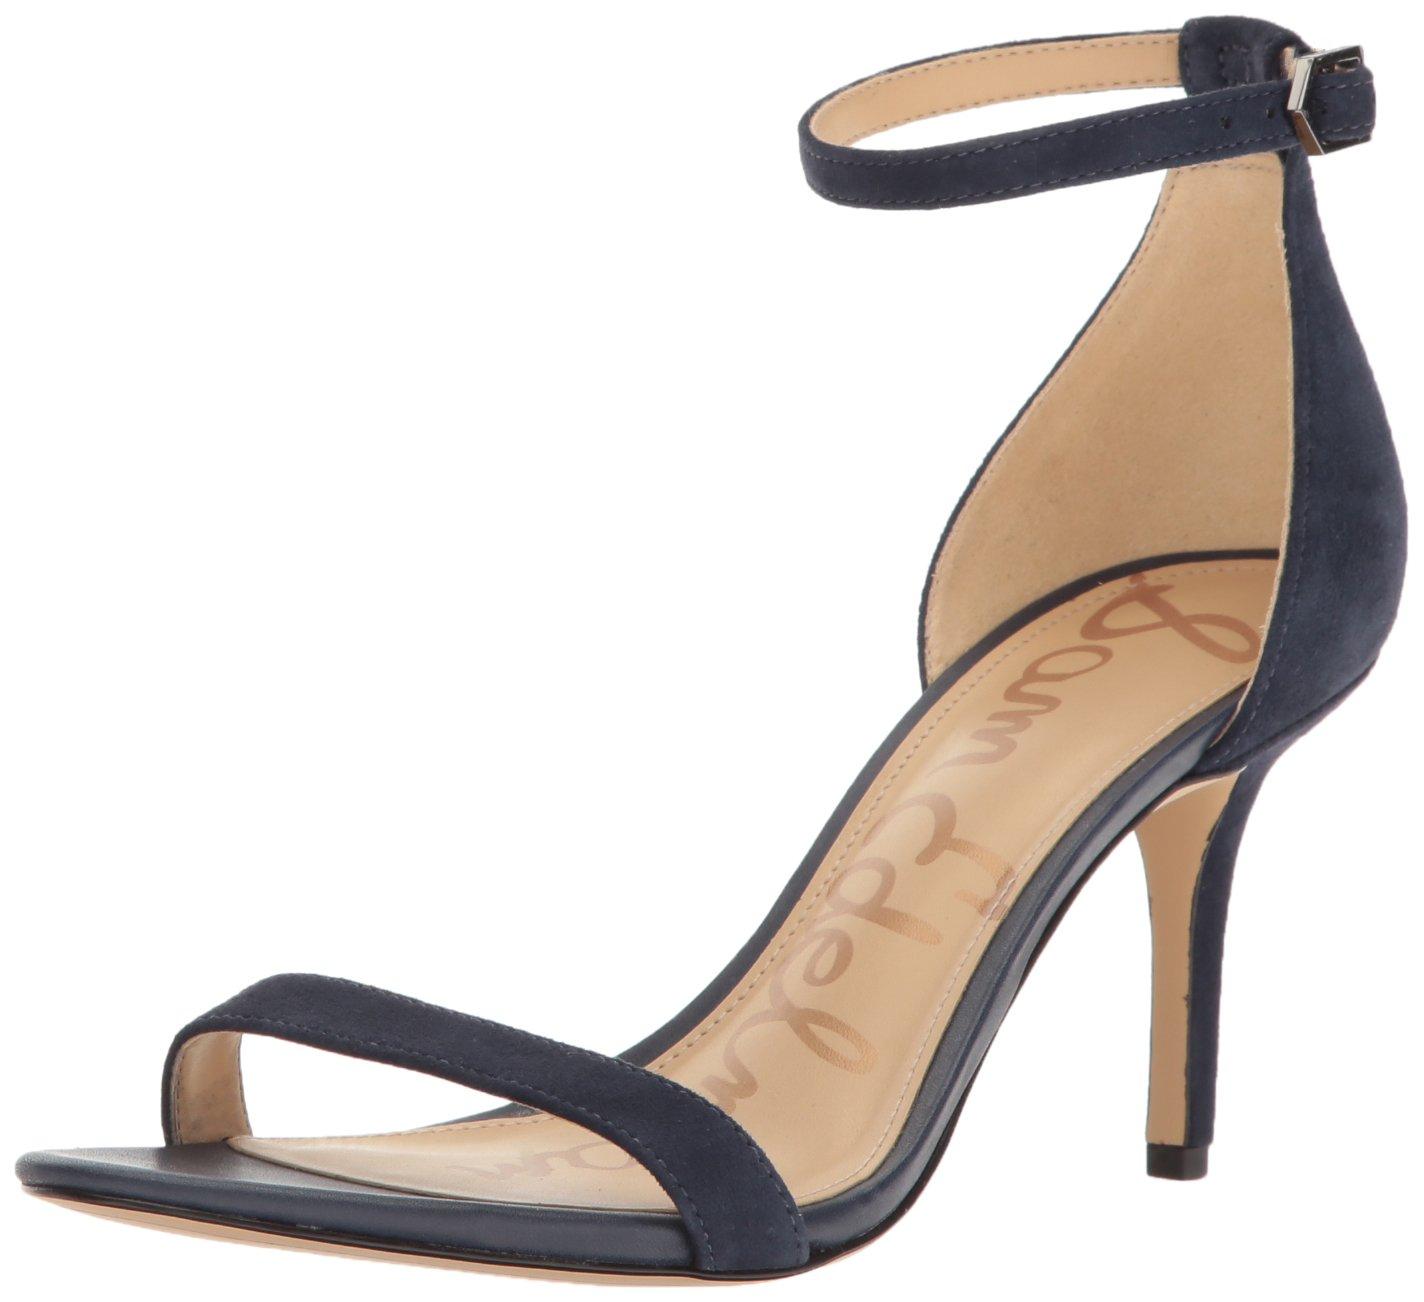 Sam Edelman Women's Patti Dress Sandal B01LY0V62D 9.5 B(M) US|Inky Navy Suede